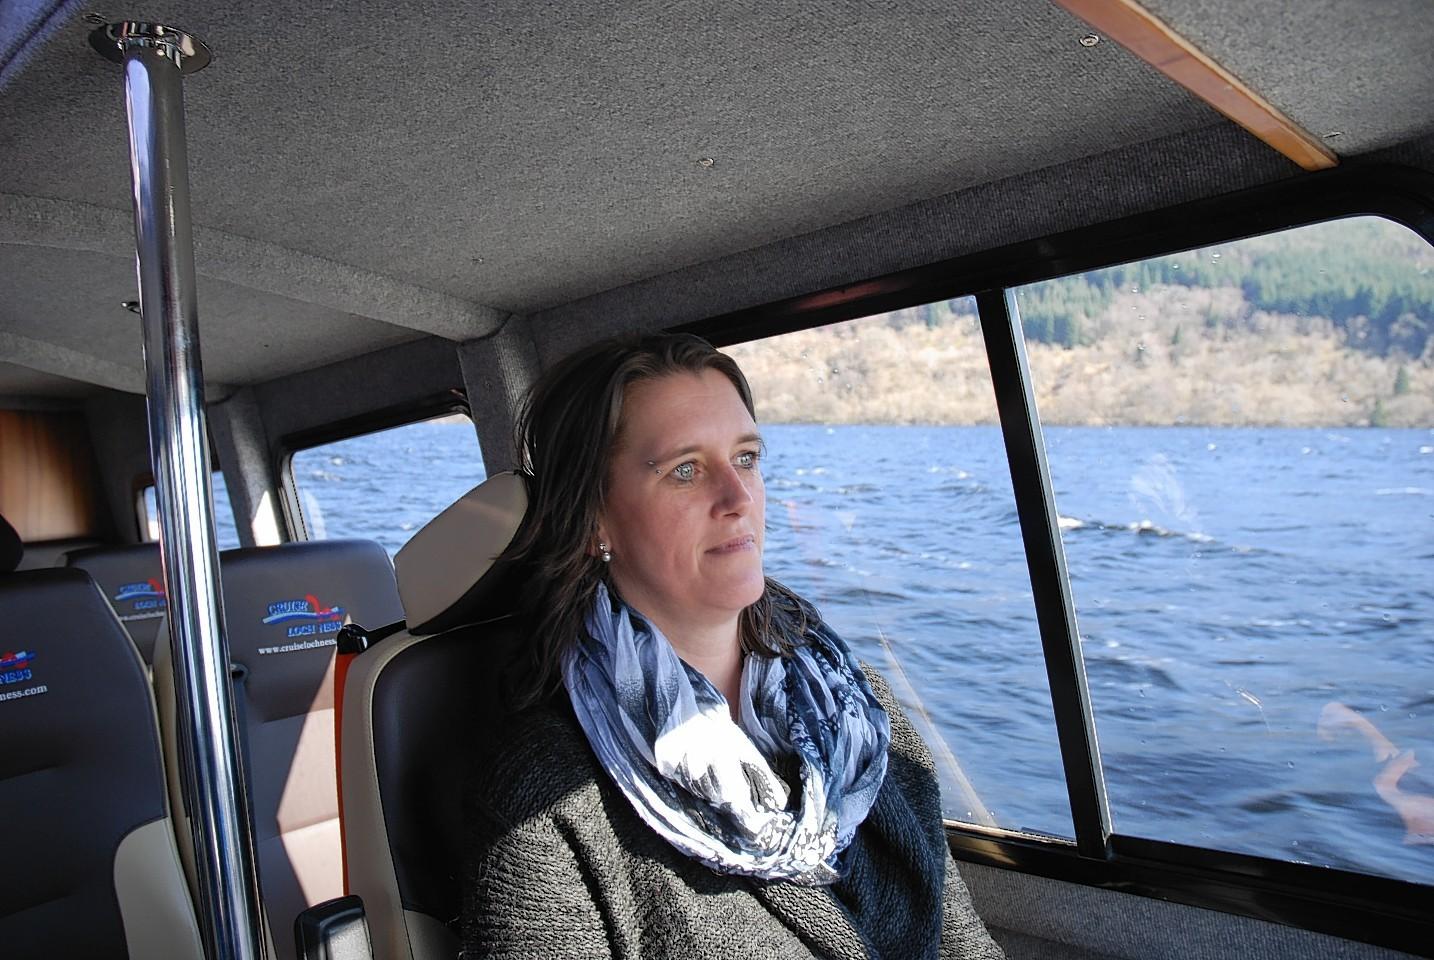 Barbara on her visit to Scotland